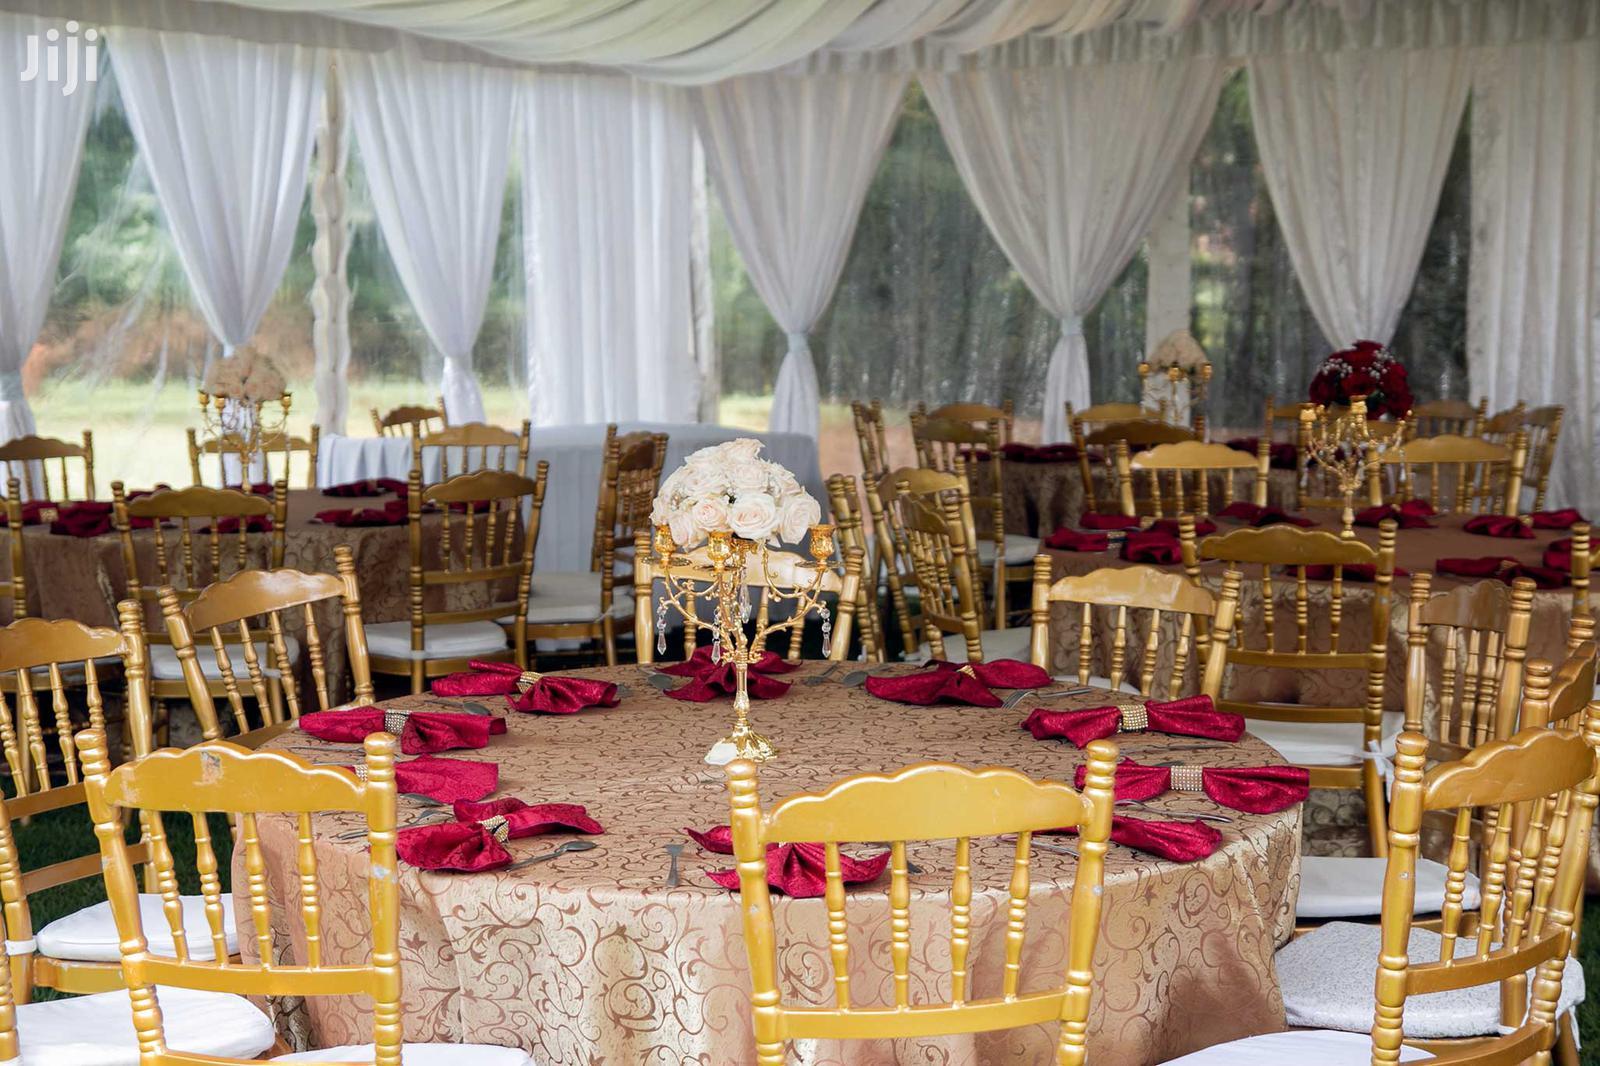 Premium Wedding Decor Services